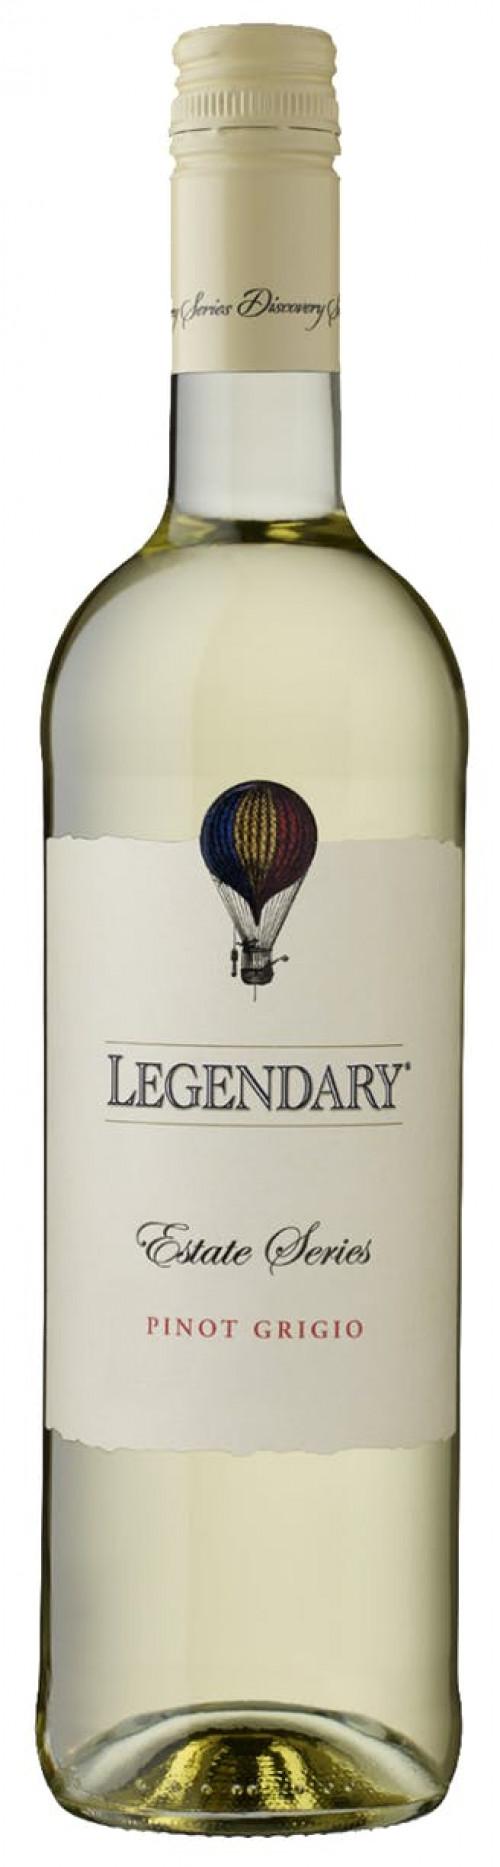 2019 Cramele Recas Legendary Pinot Grigio 750Ml